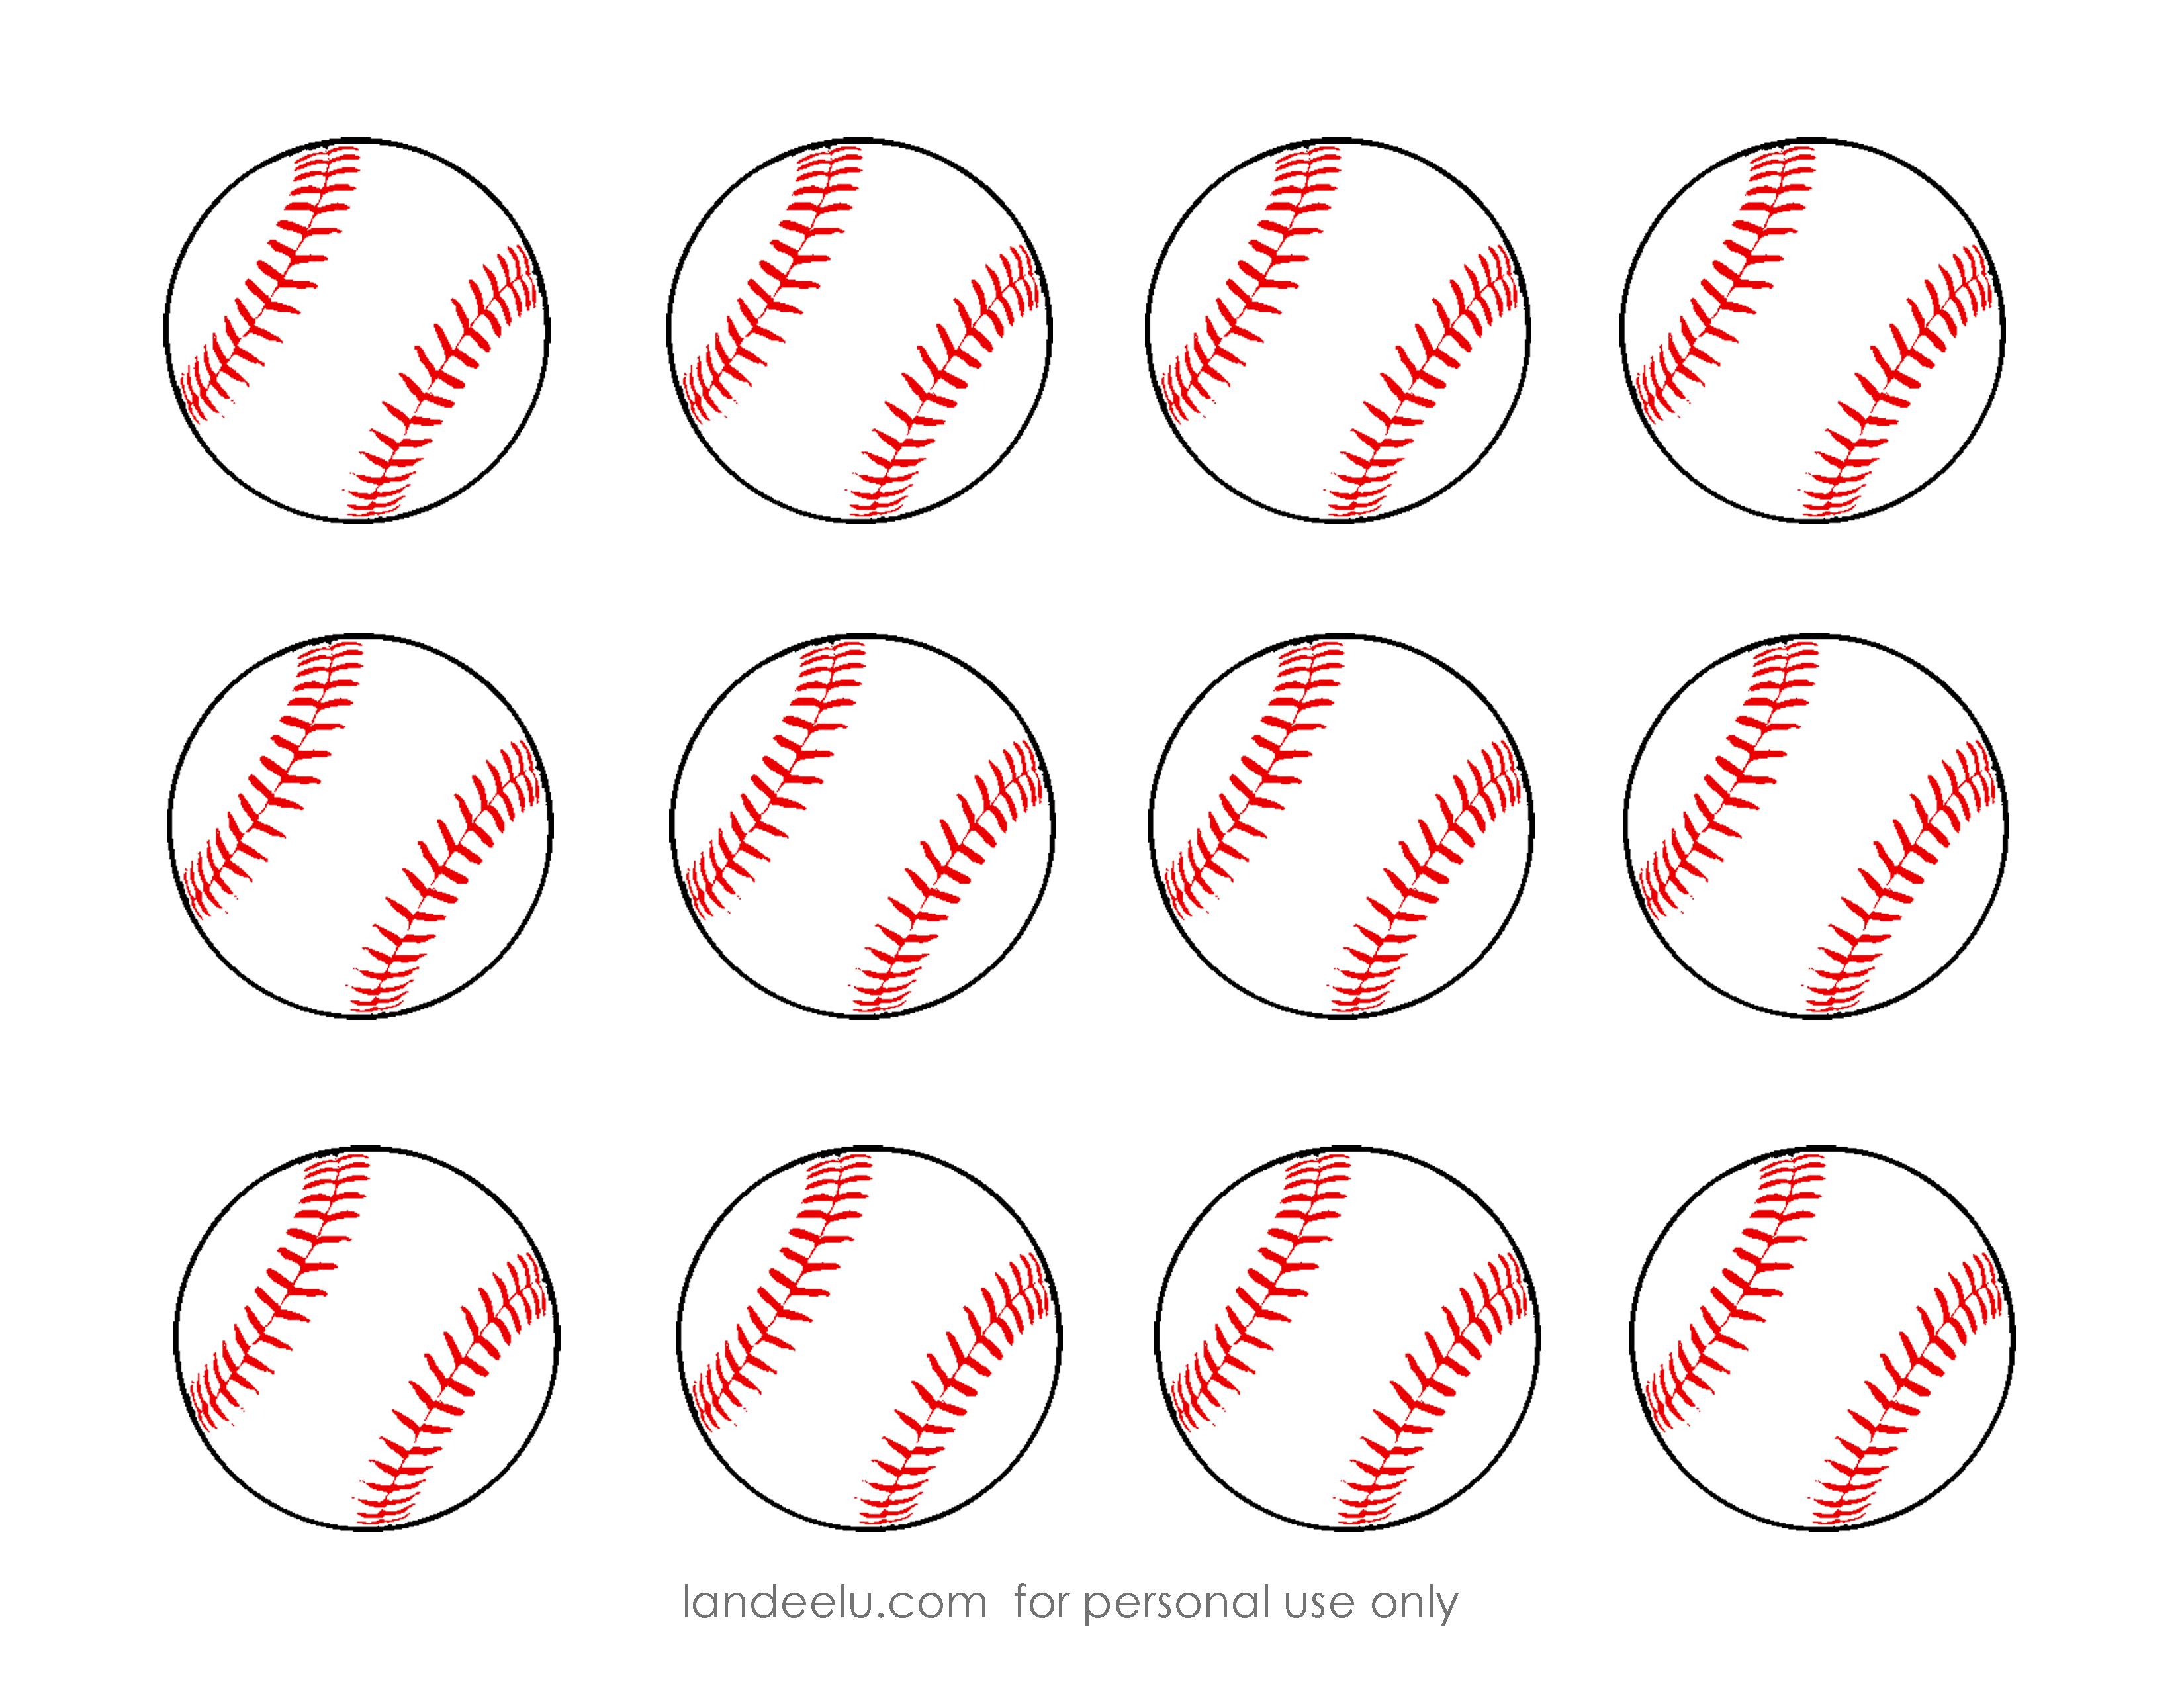 Free Printable Baseball Clip Art Images | Inch Circle Punch Or - Free Printable Softball Images